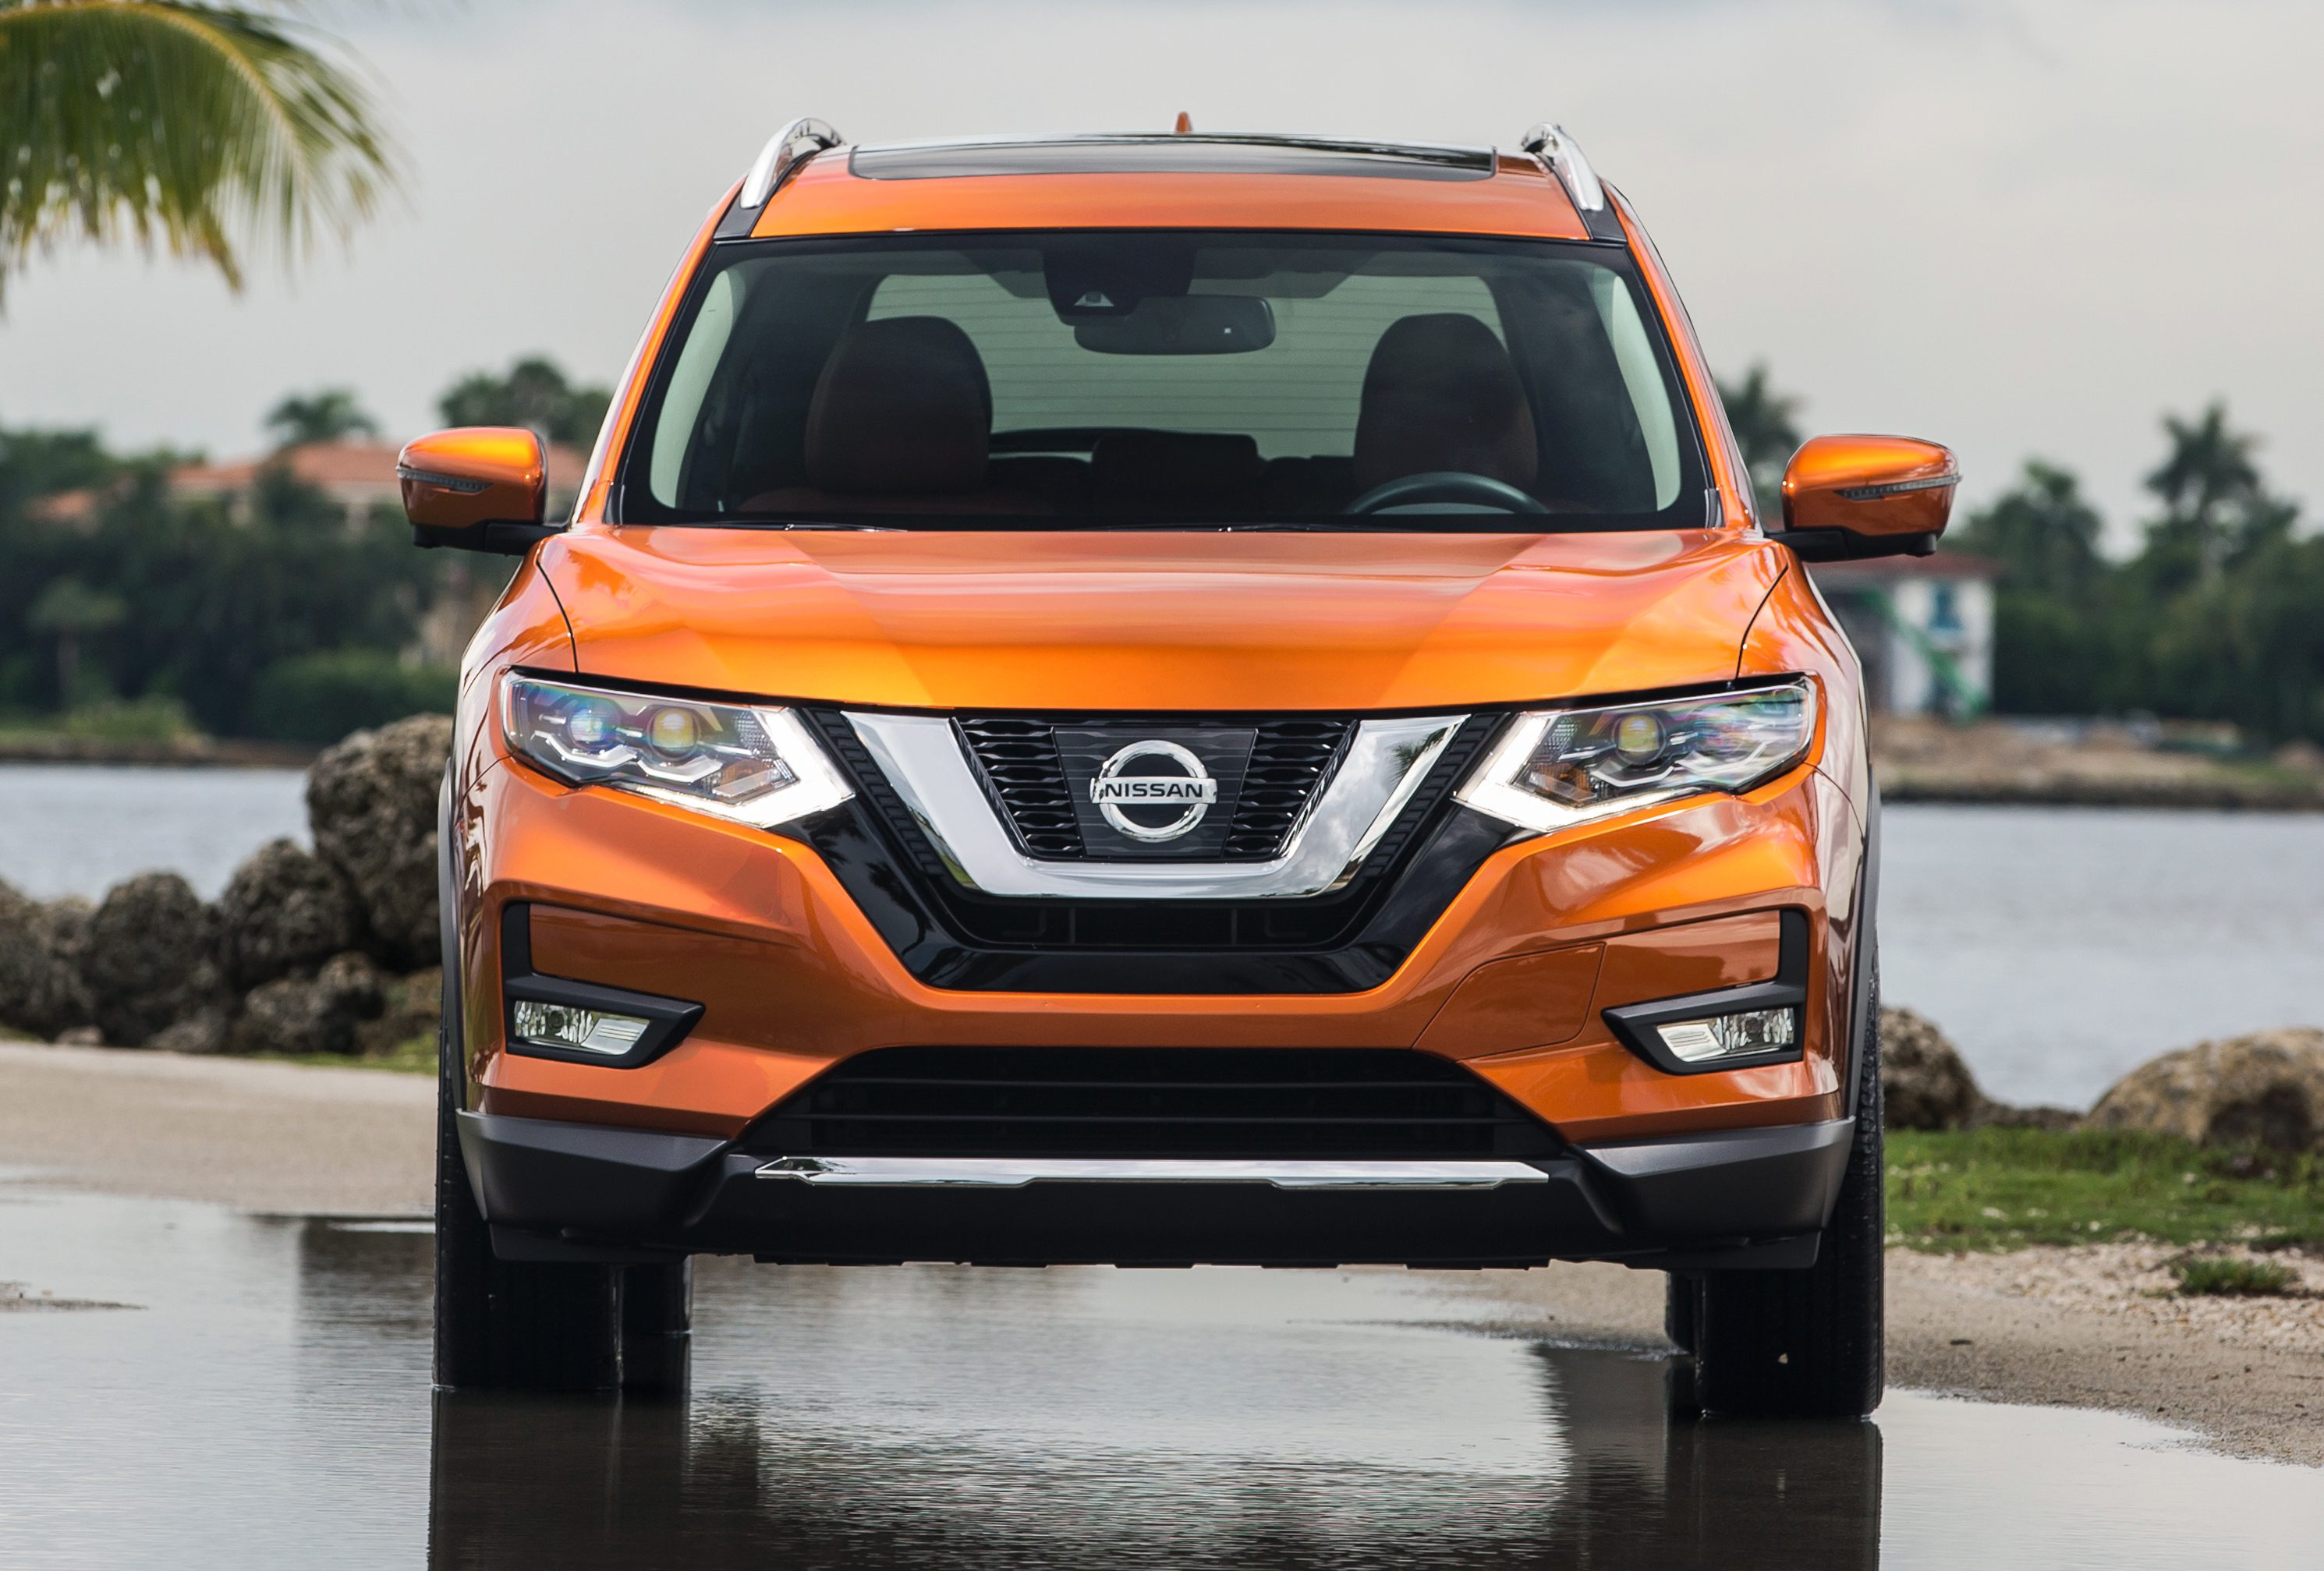 Nissan Rogue 小改款面市,本地 X-Trail 会跟进吗? 2017 ...